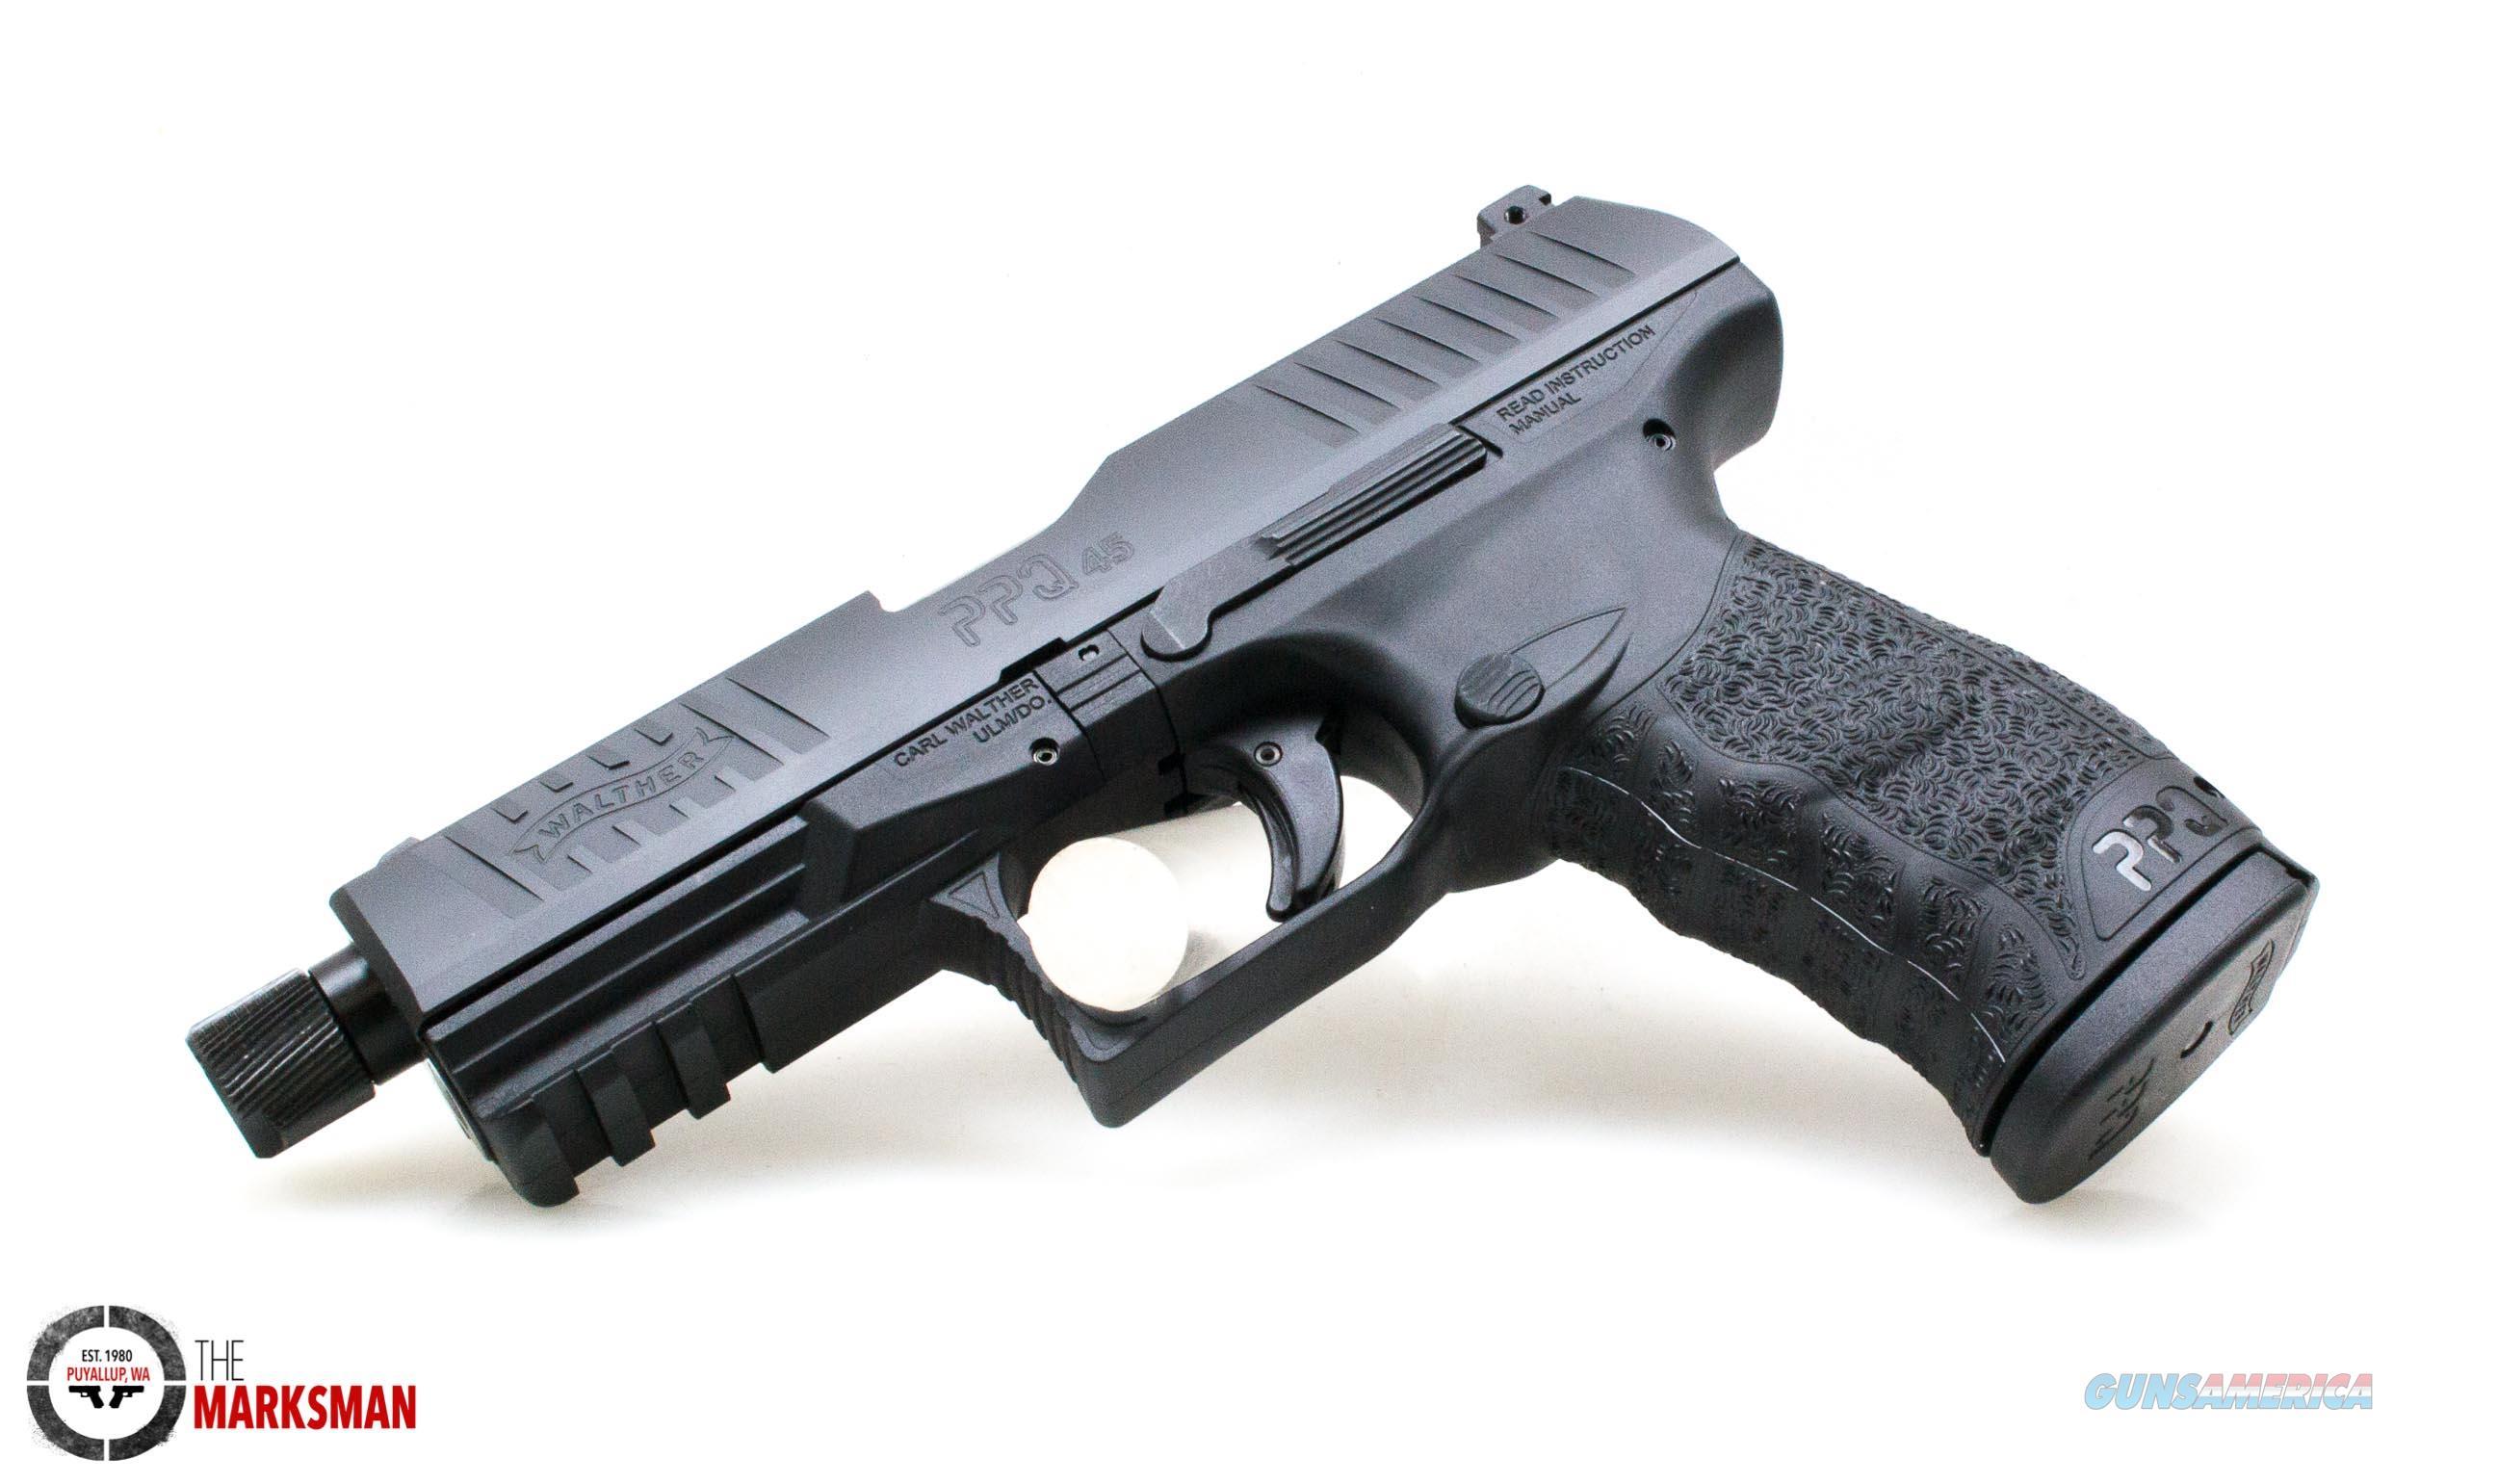 Walther PPQ M2 SD, .45 ACP NEW Threaded Barrel  Guns > Pistols > Walther Pistols > Post WWII > P99/PPQ